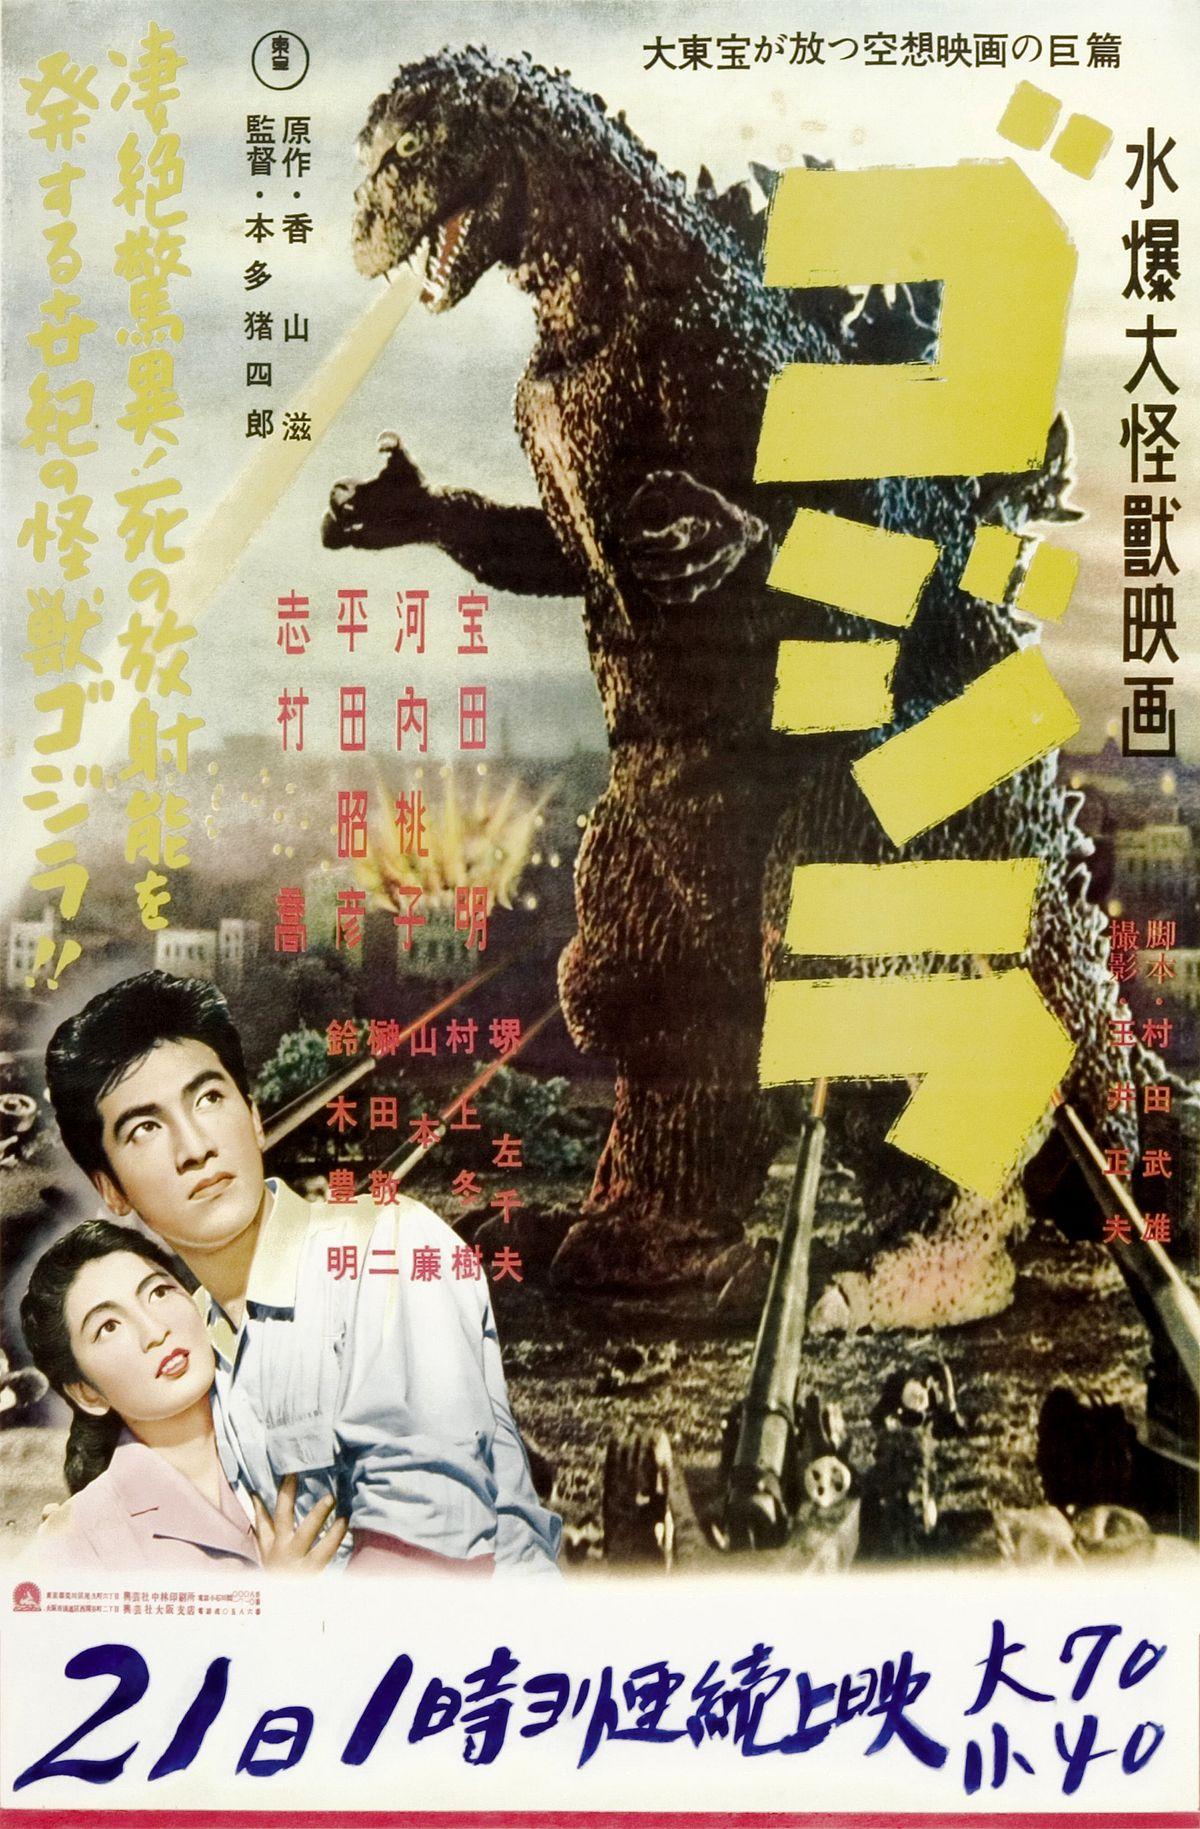 1200px-Gojira 1954 poster 3